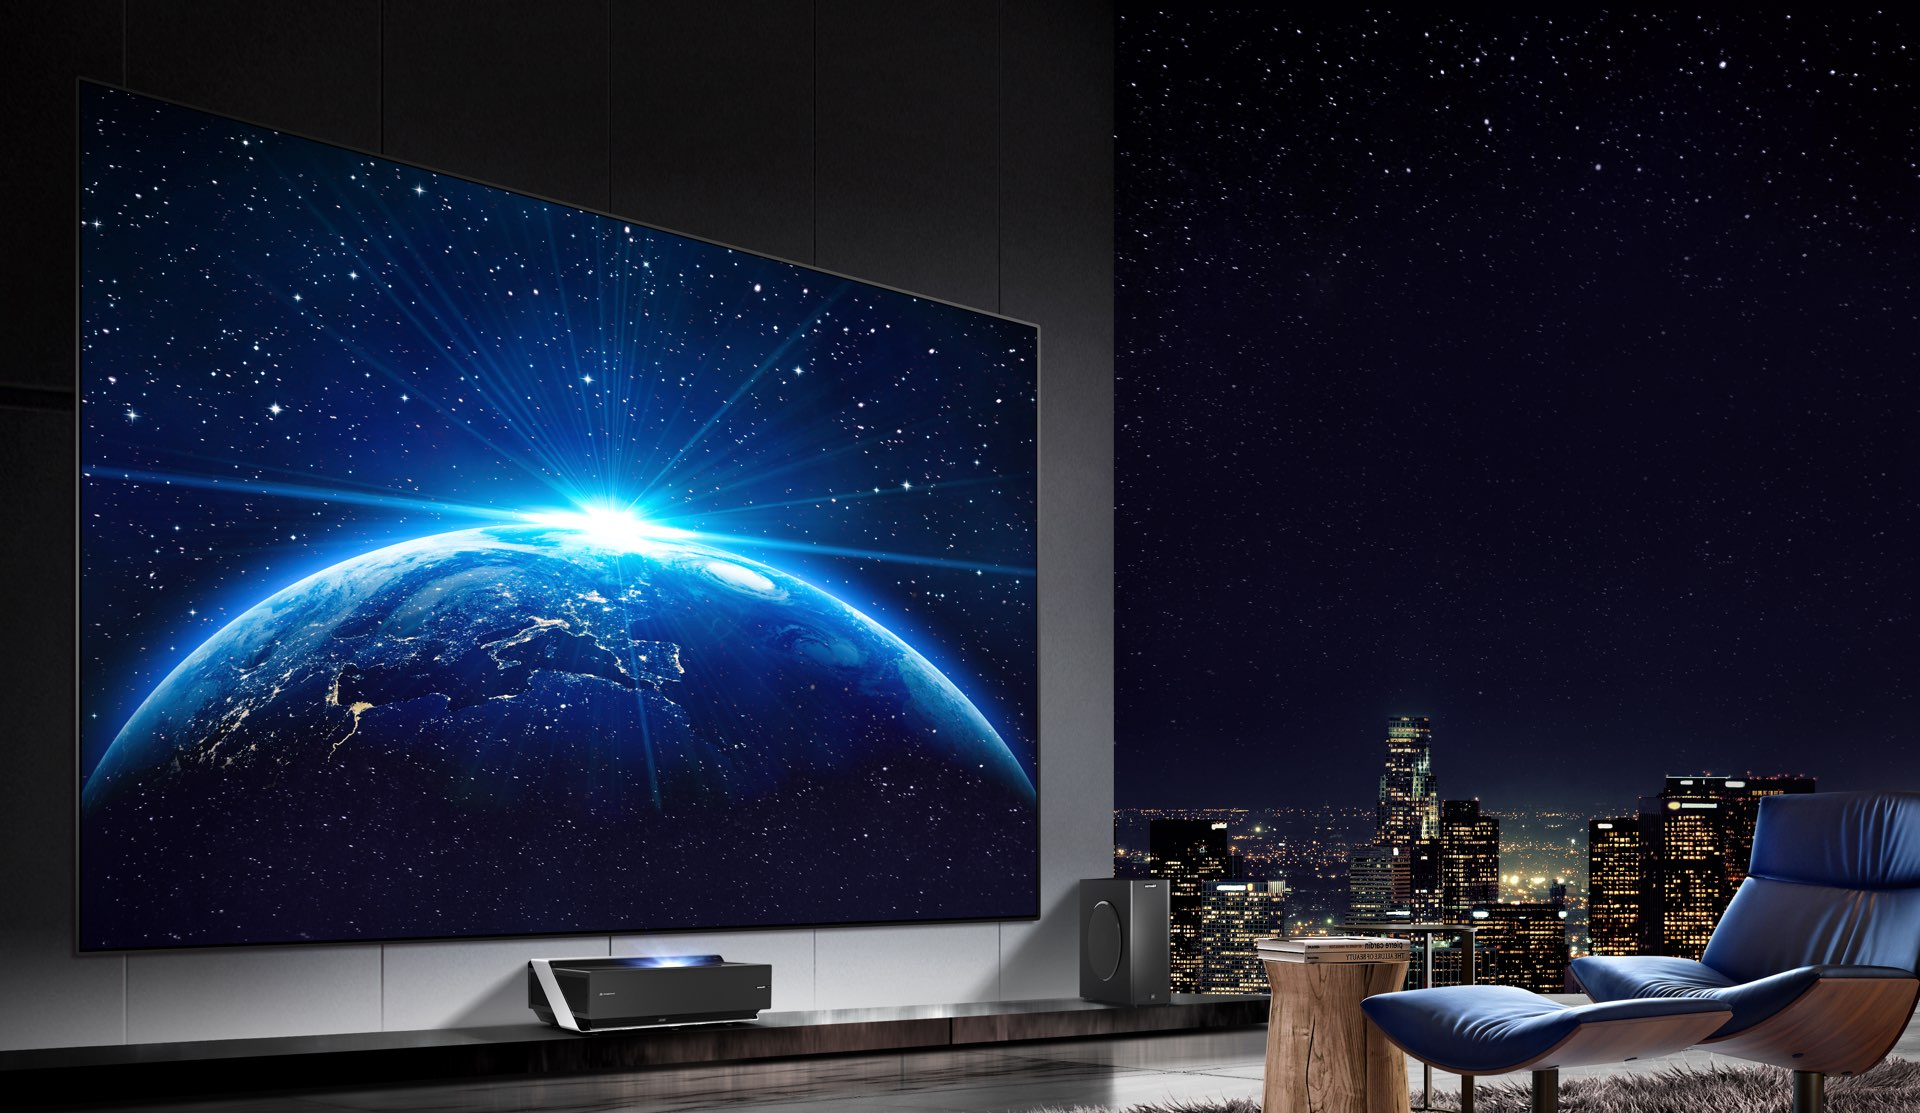 Hisense TriChroma LaserTV,